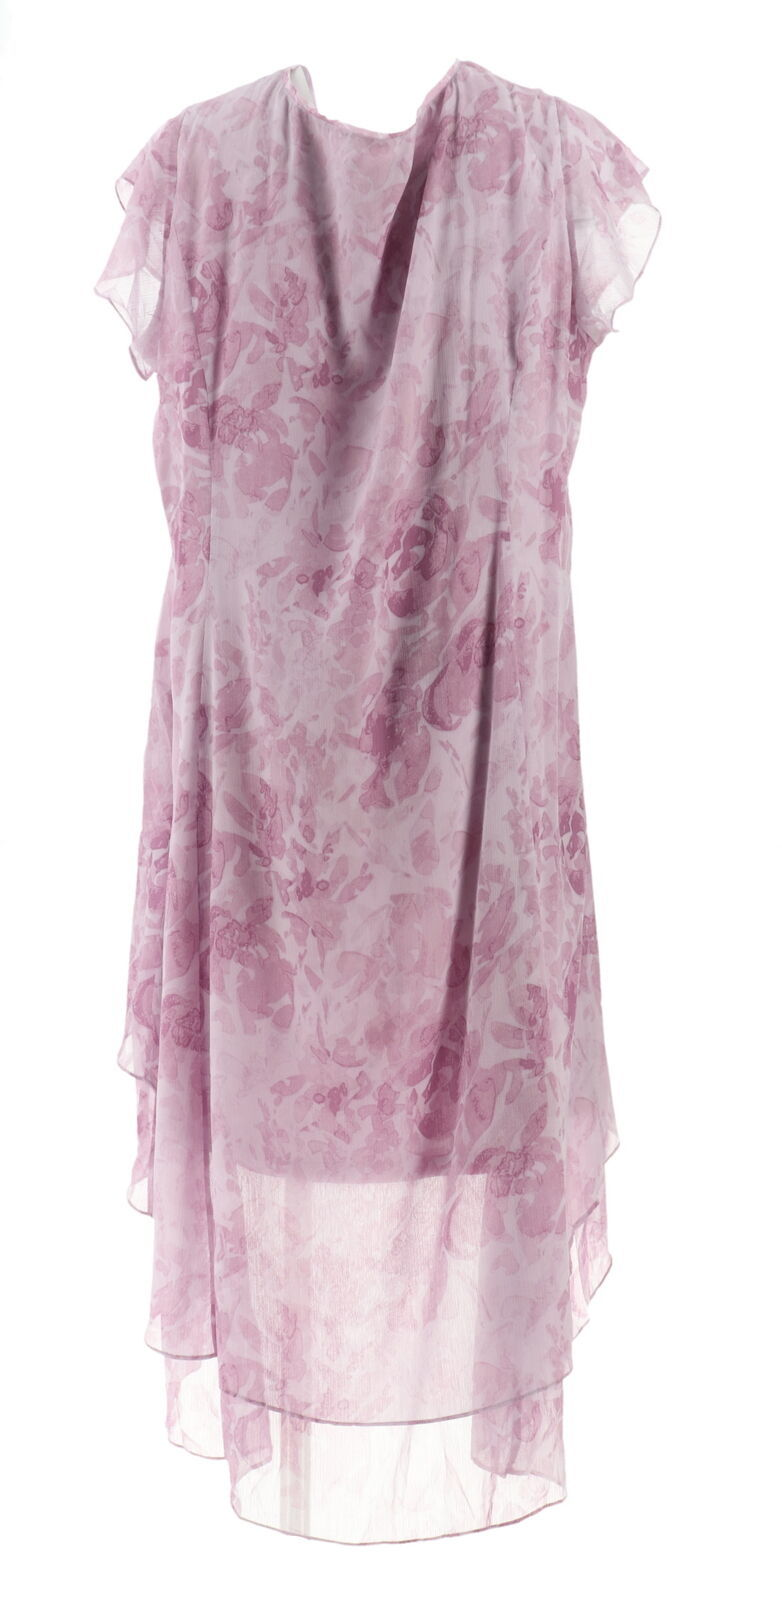 H Halston Petite Rose Print Cap Slv Hi-Low Dress French Lilac 24P NEW A303199 image 3